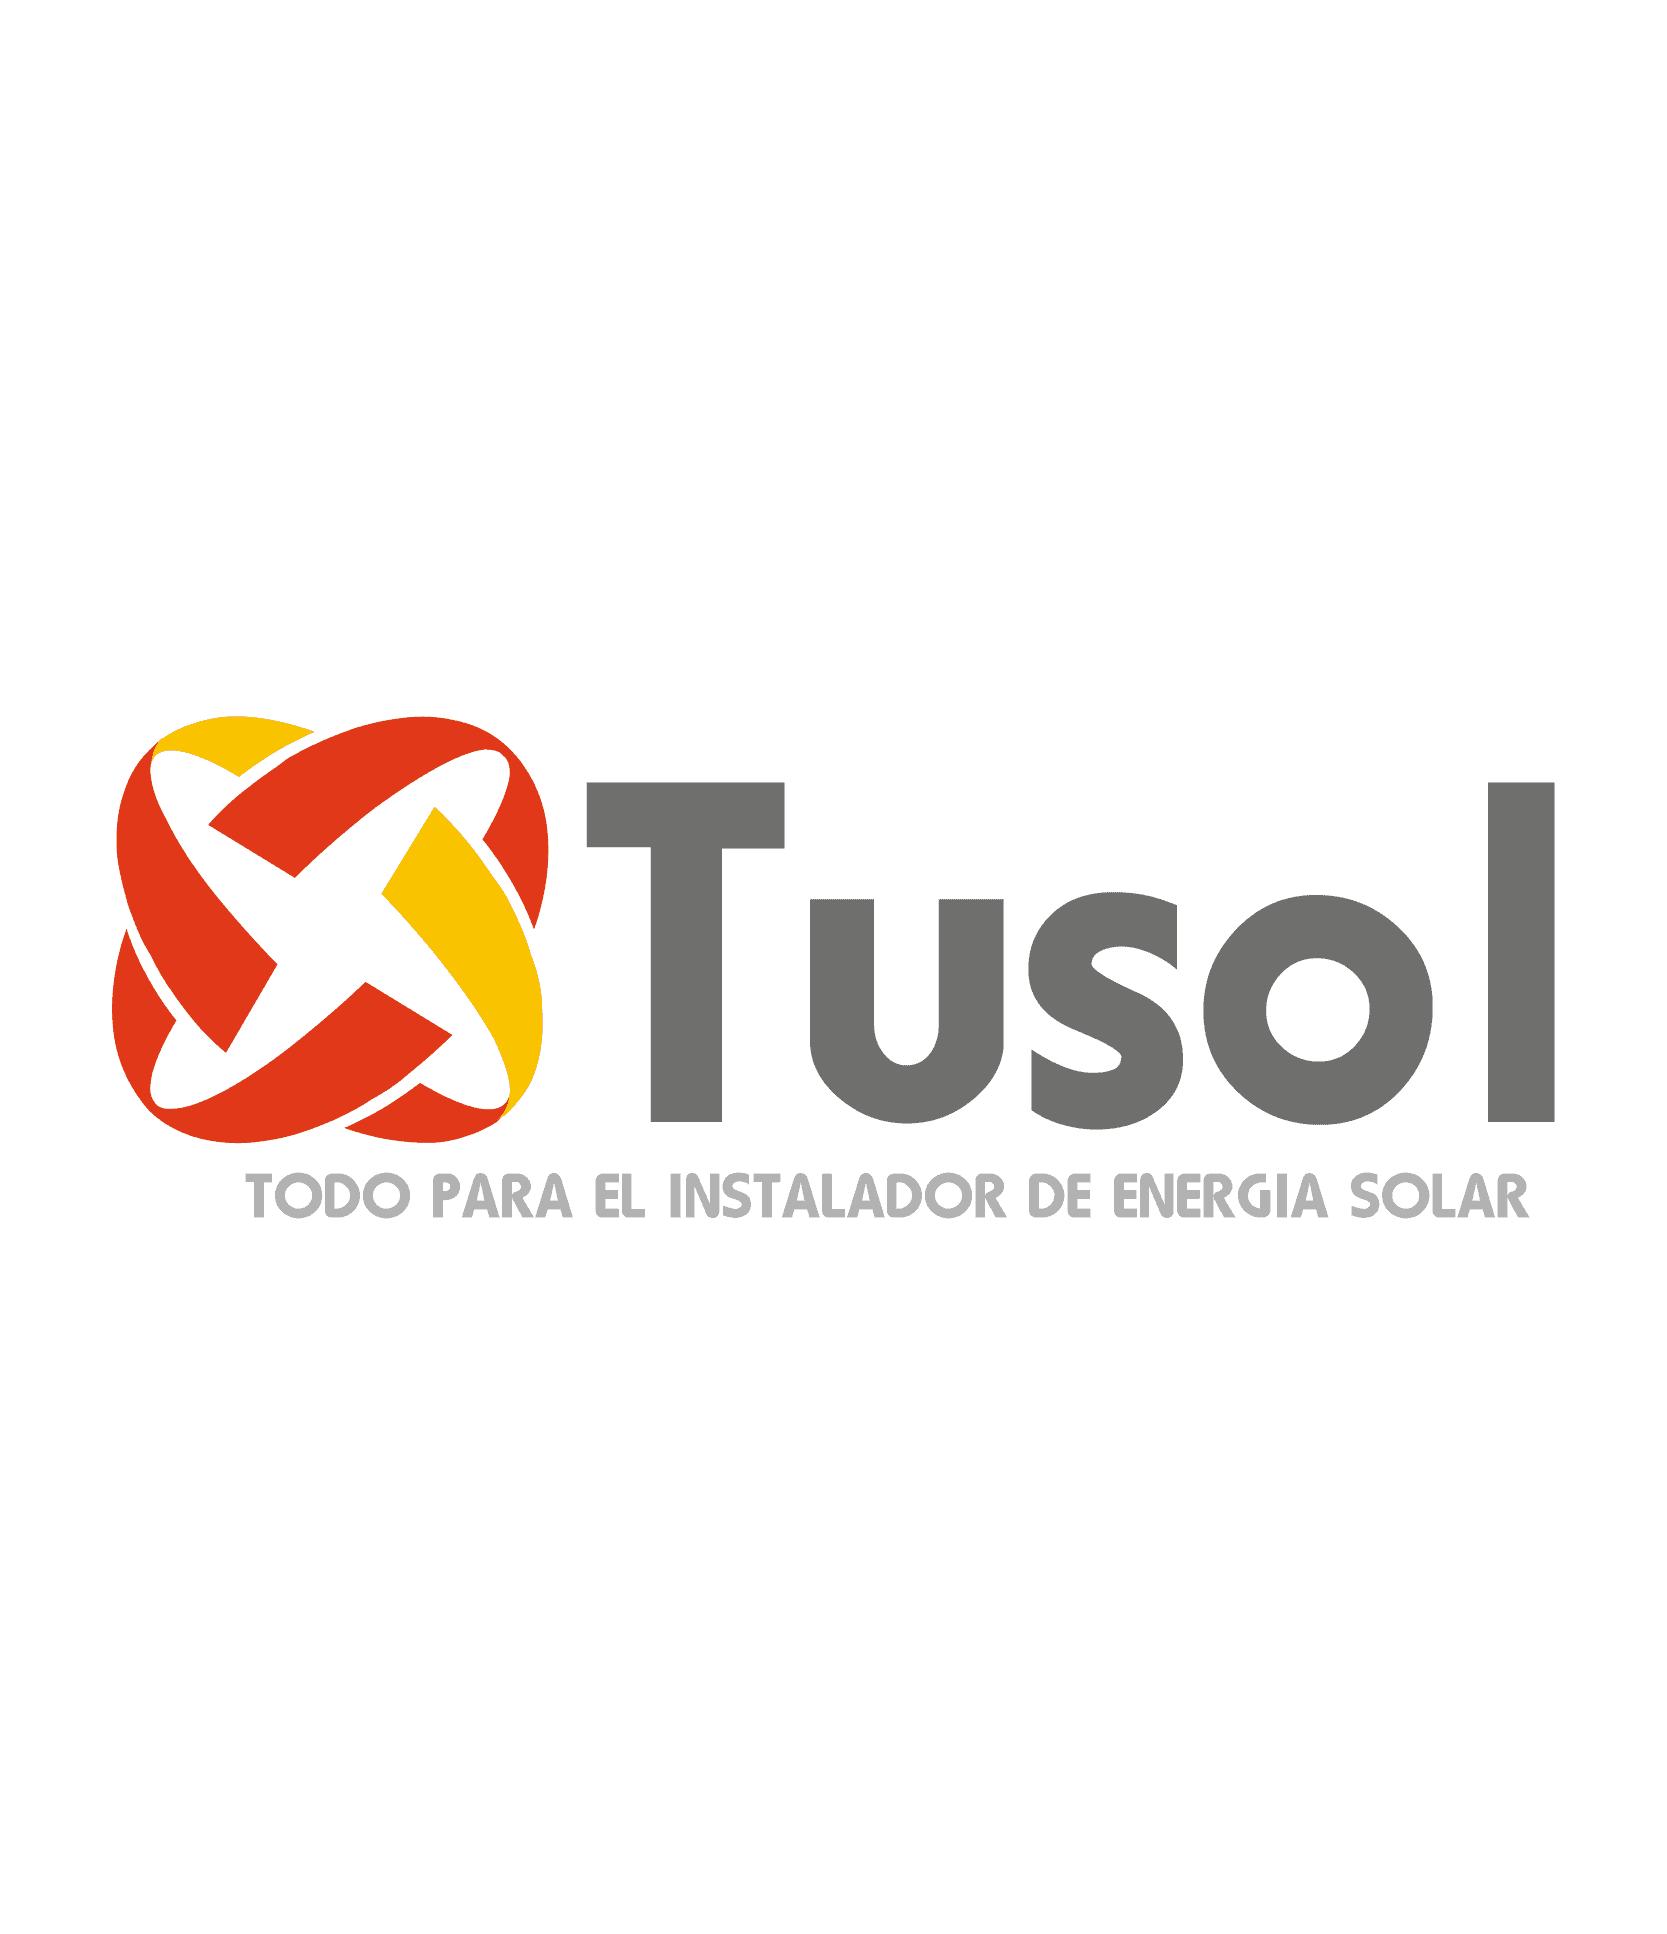 TUSOL SISTEMAS ENERGÉTICOS SL